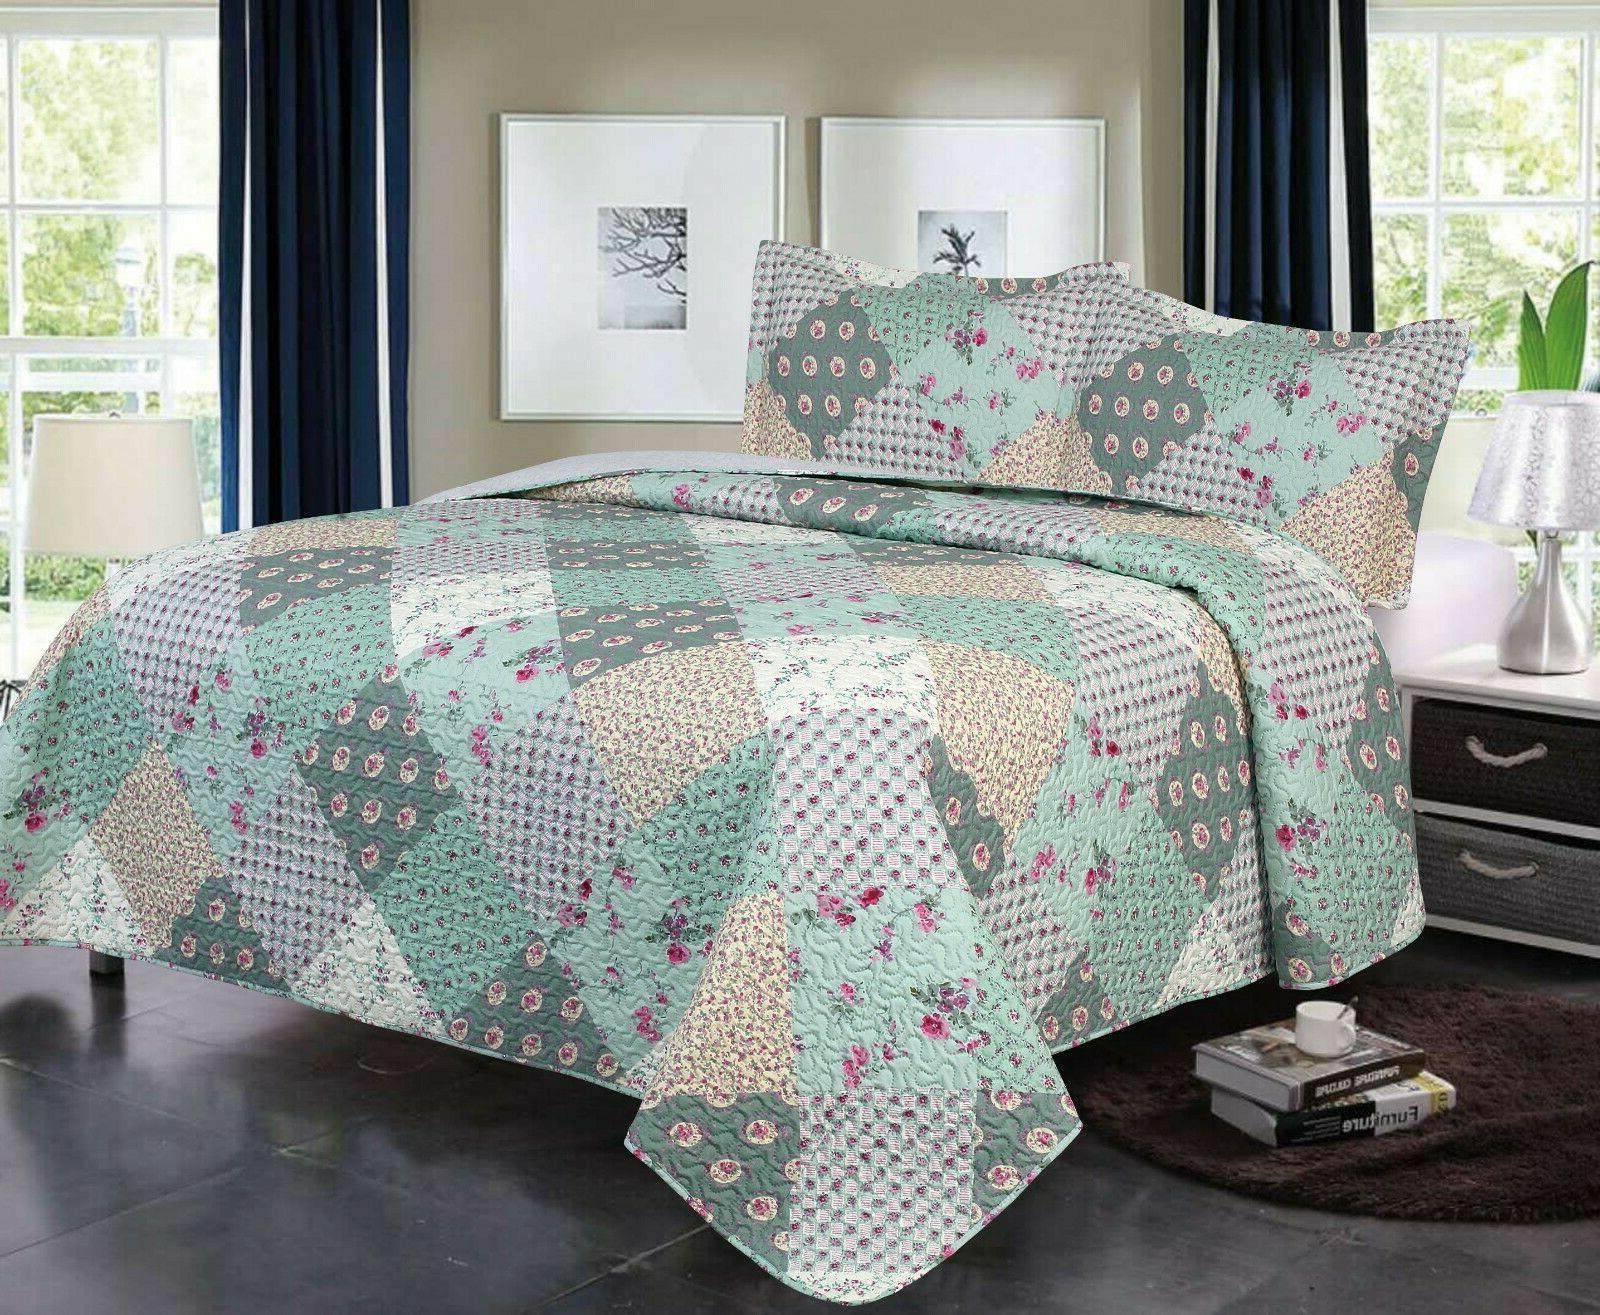 3 piece queen king quilt plaid patchwork